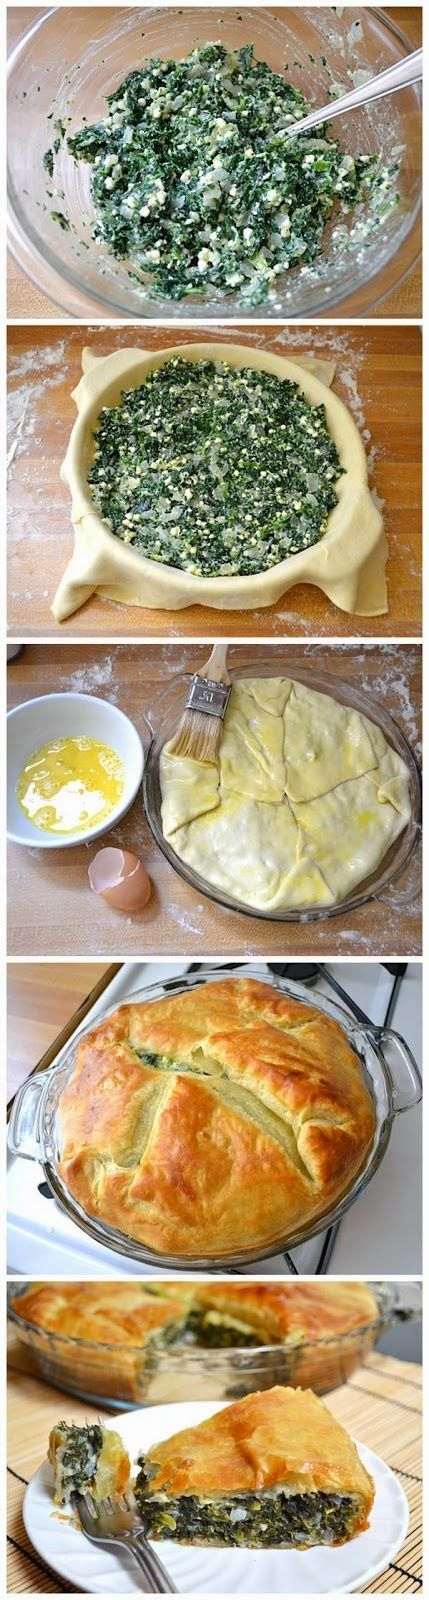 Spinach Pie http://www.budgetbytes.com/2012/09/spinach-pie/                                                                                                                                                      Más